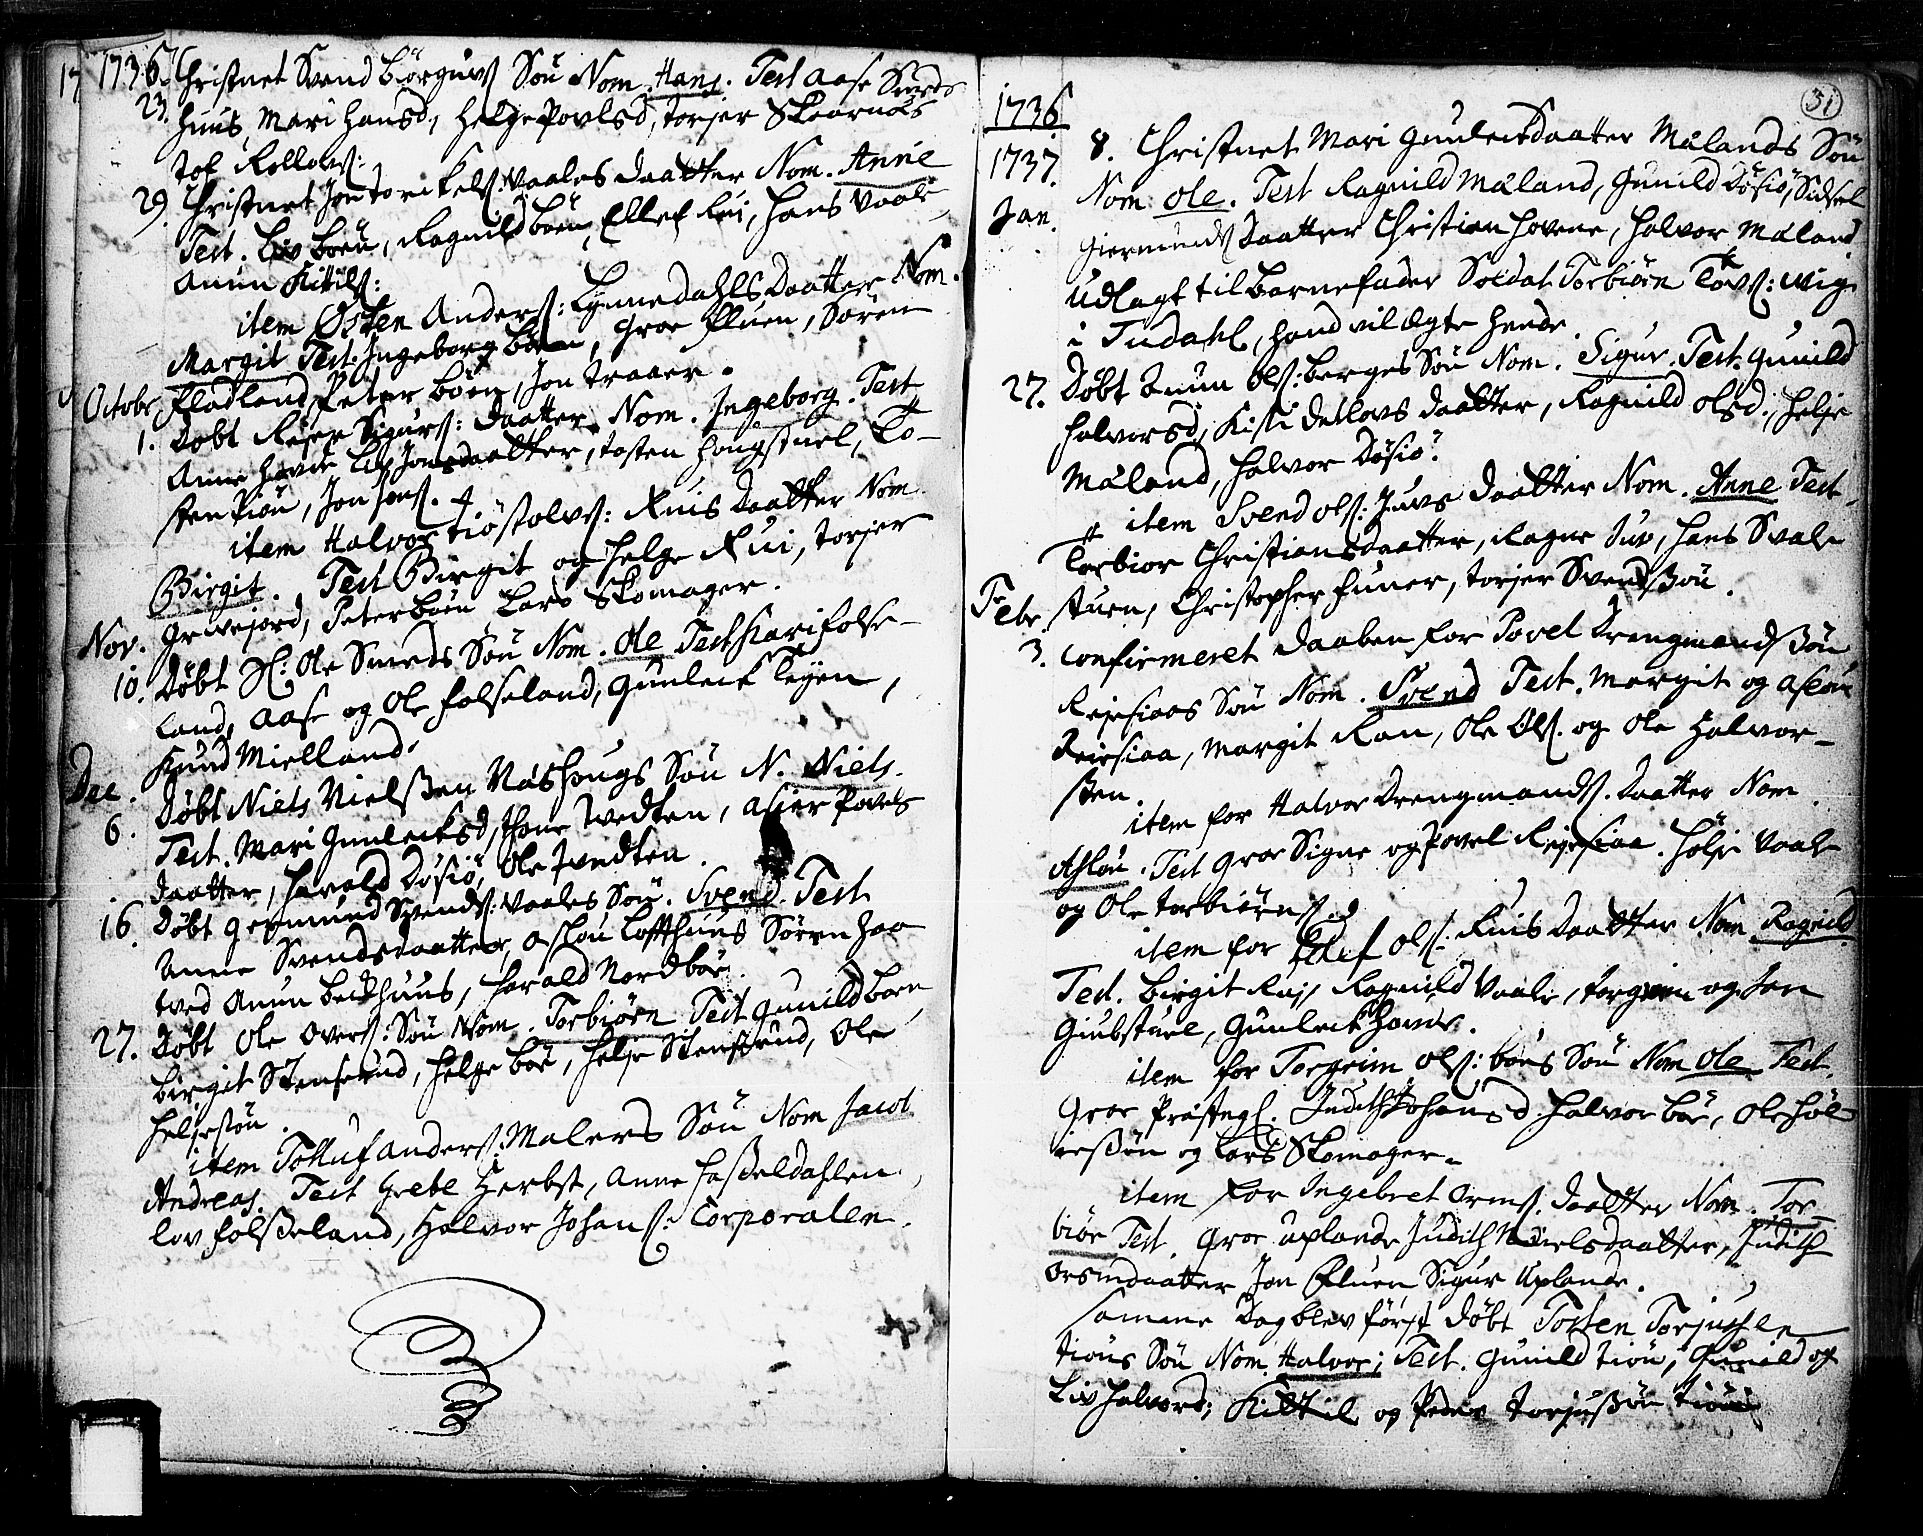 SAKO, Hjartdal kirkebøker, F/Fa/L0003: Ministerialbok nr. I 3, 1727-1775, s. 31